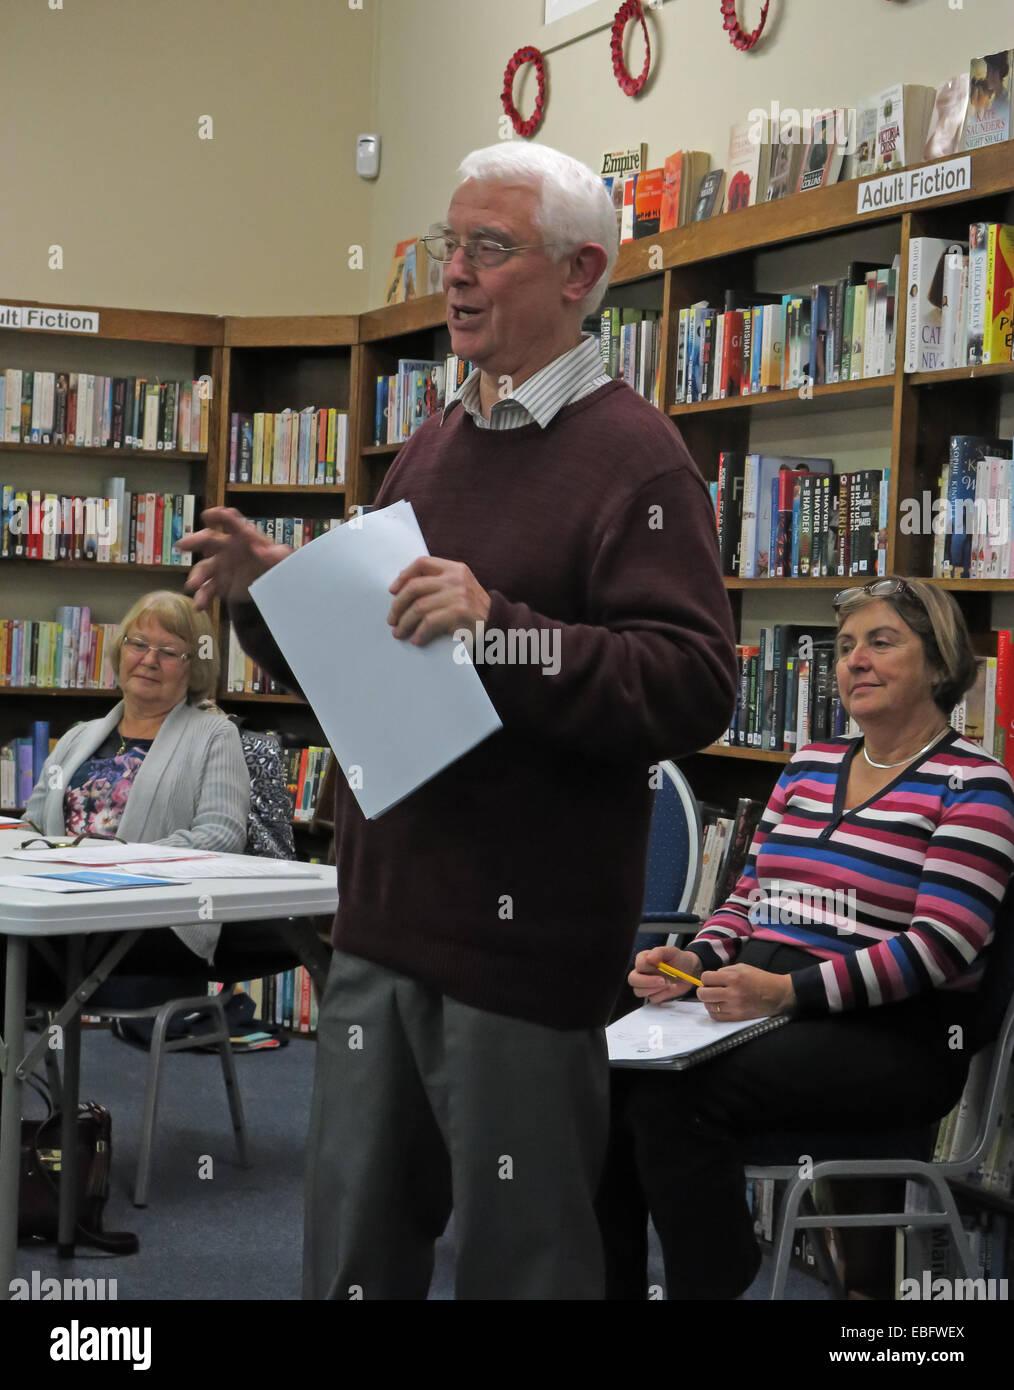 John,Ashby,chairman,Grappenhall,Community,Library. AGM 2014,John Ashby,Sheelagh,Connolly,Sheila,Wallace,Warrington,Cheshire,WA4 2PE,WA42PE,charity,annual,general,meeting,space,gotonysmith